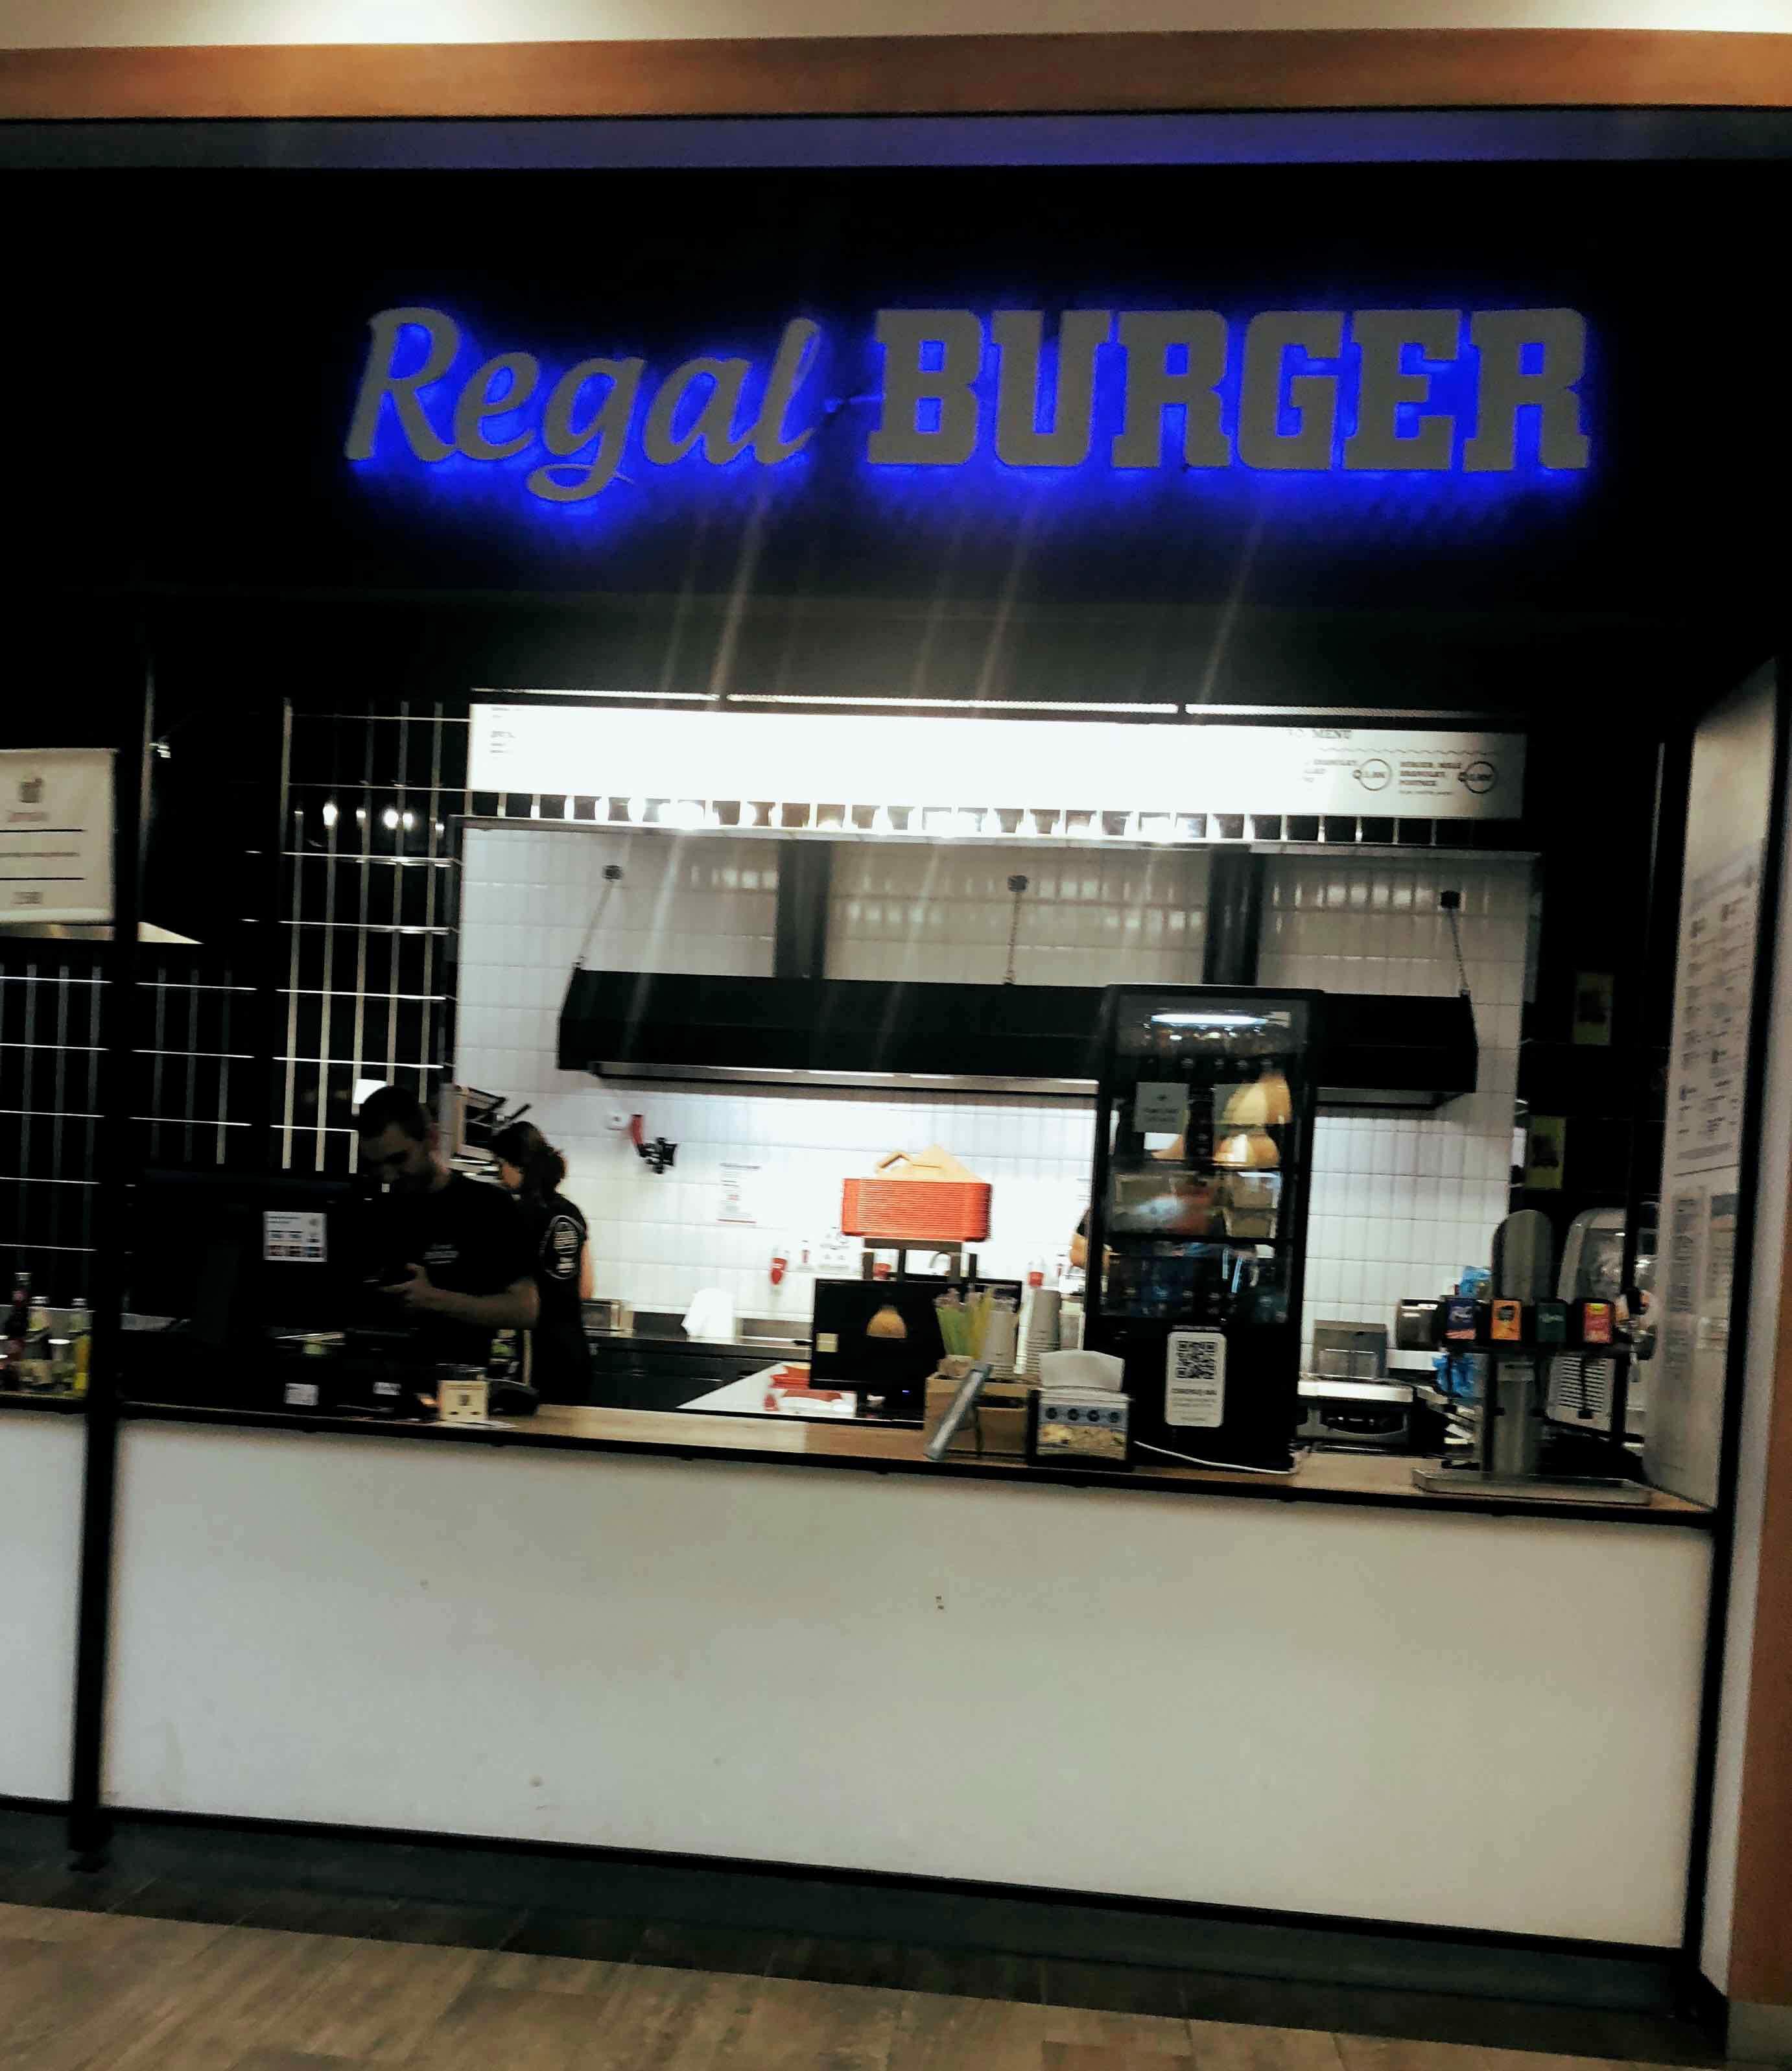 RogalBurger